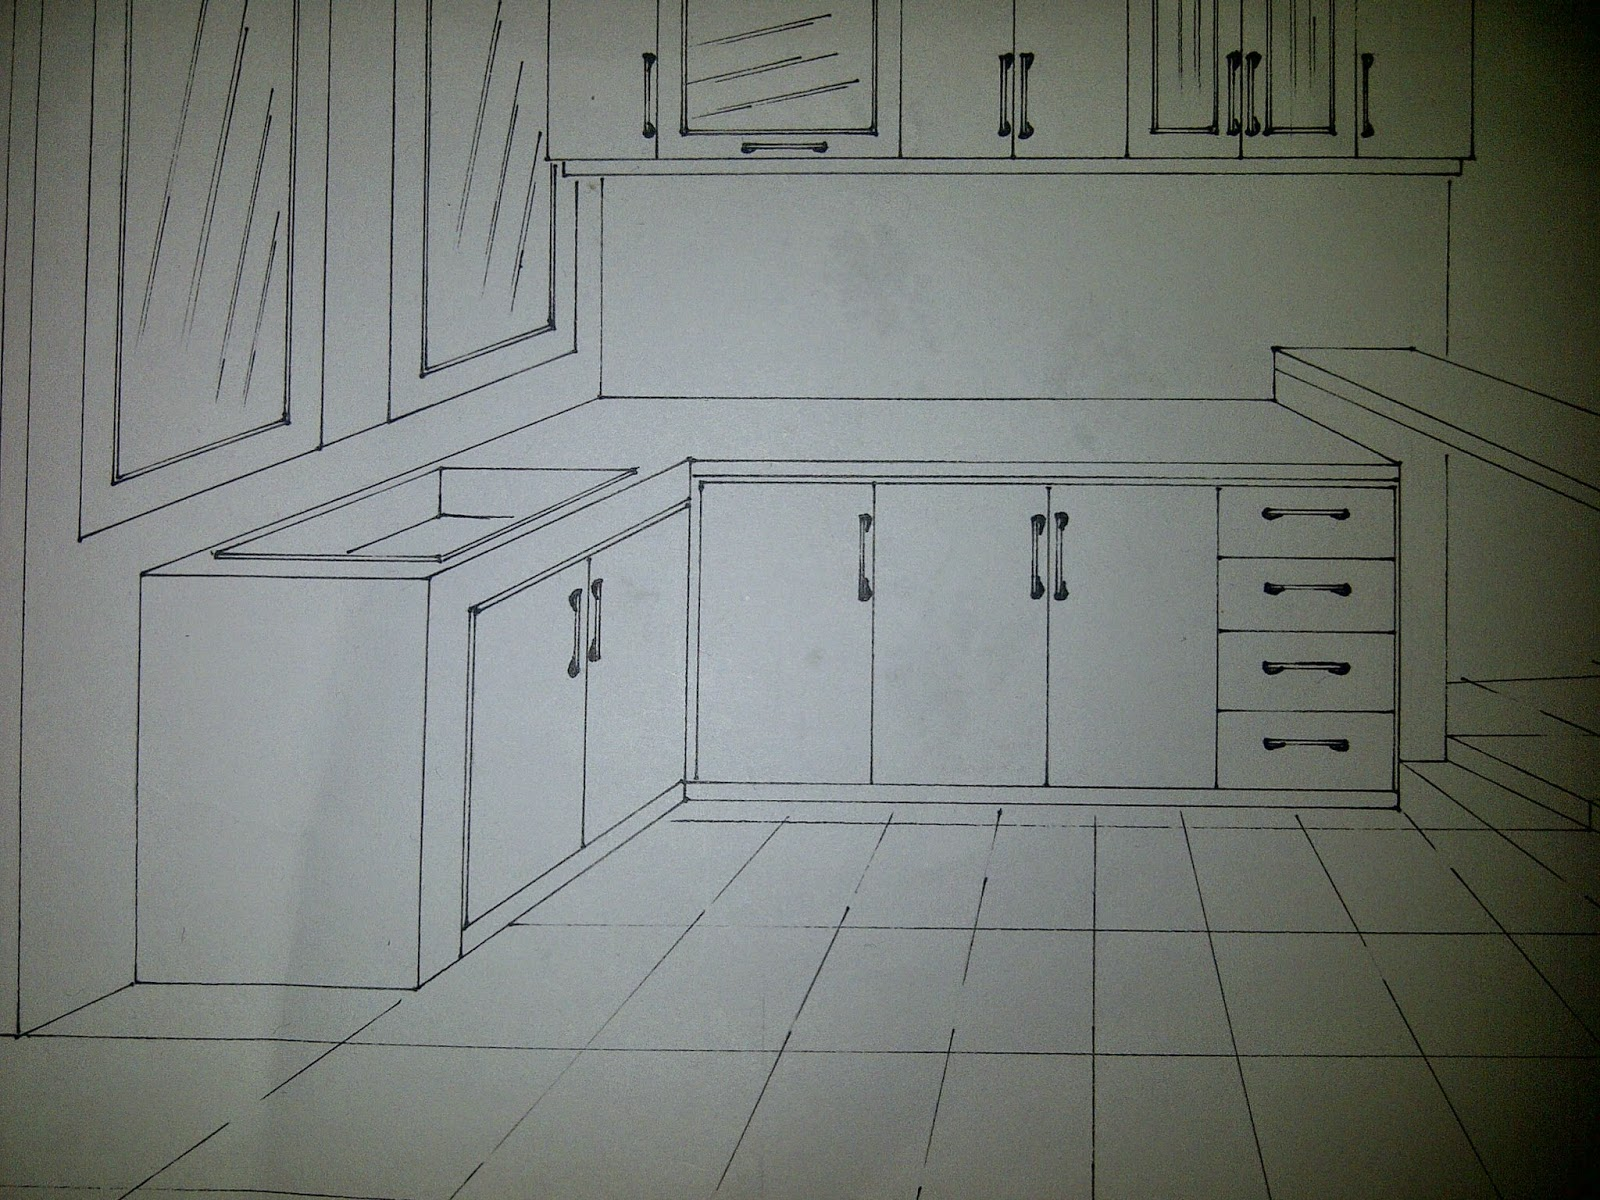 cara perhitungan biaya kitchen set